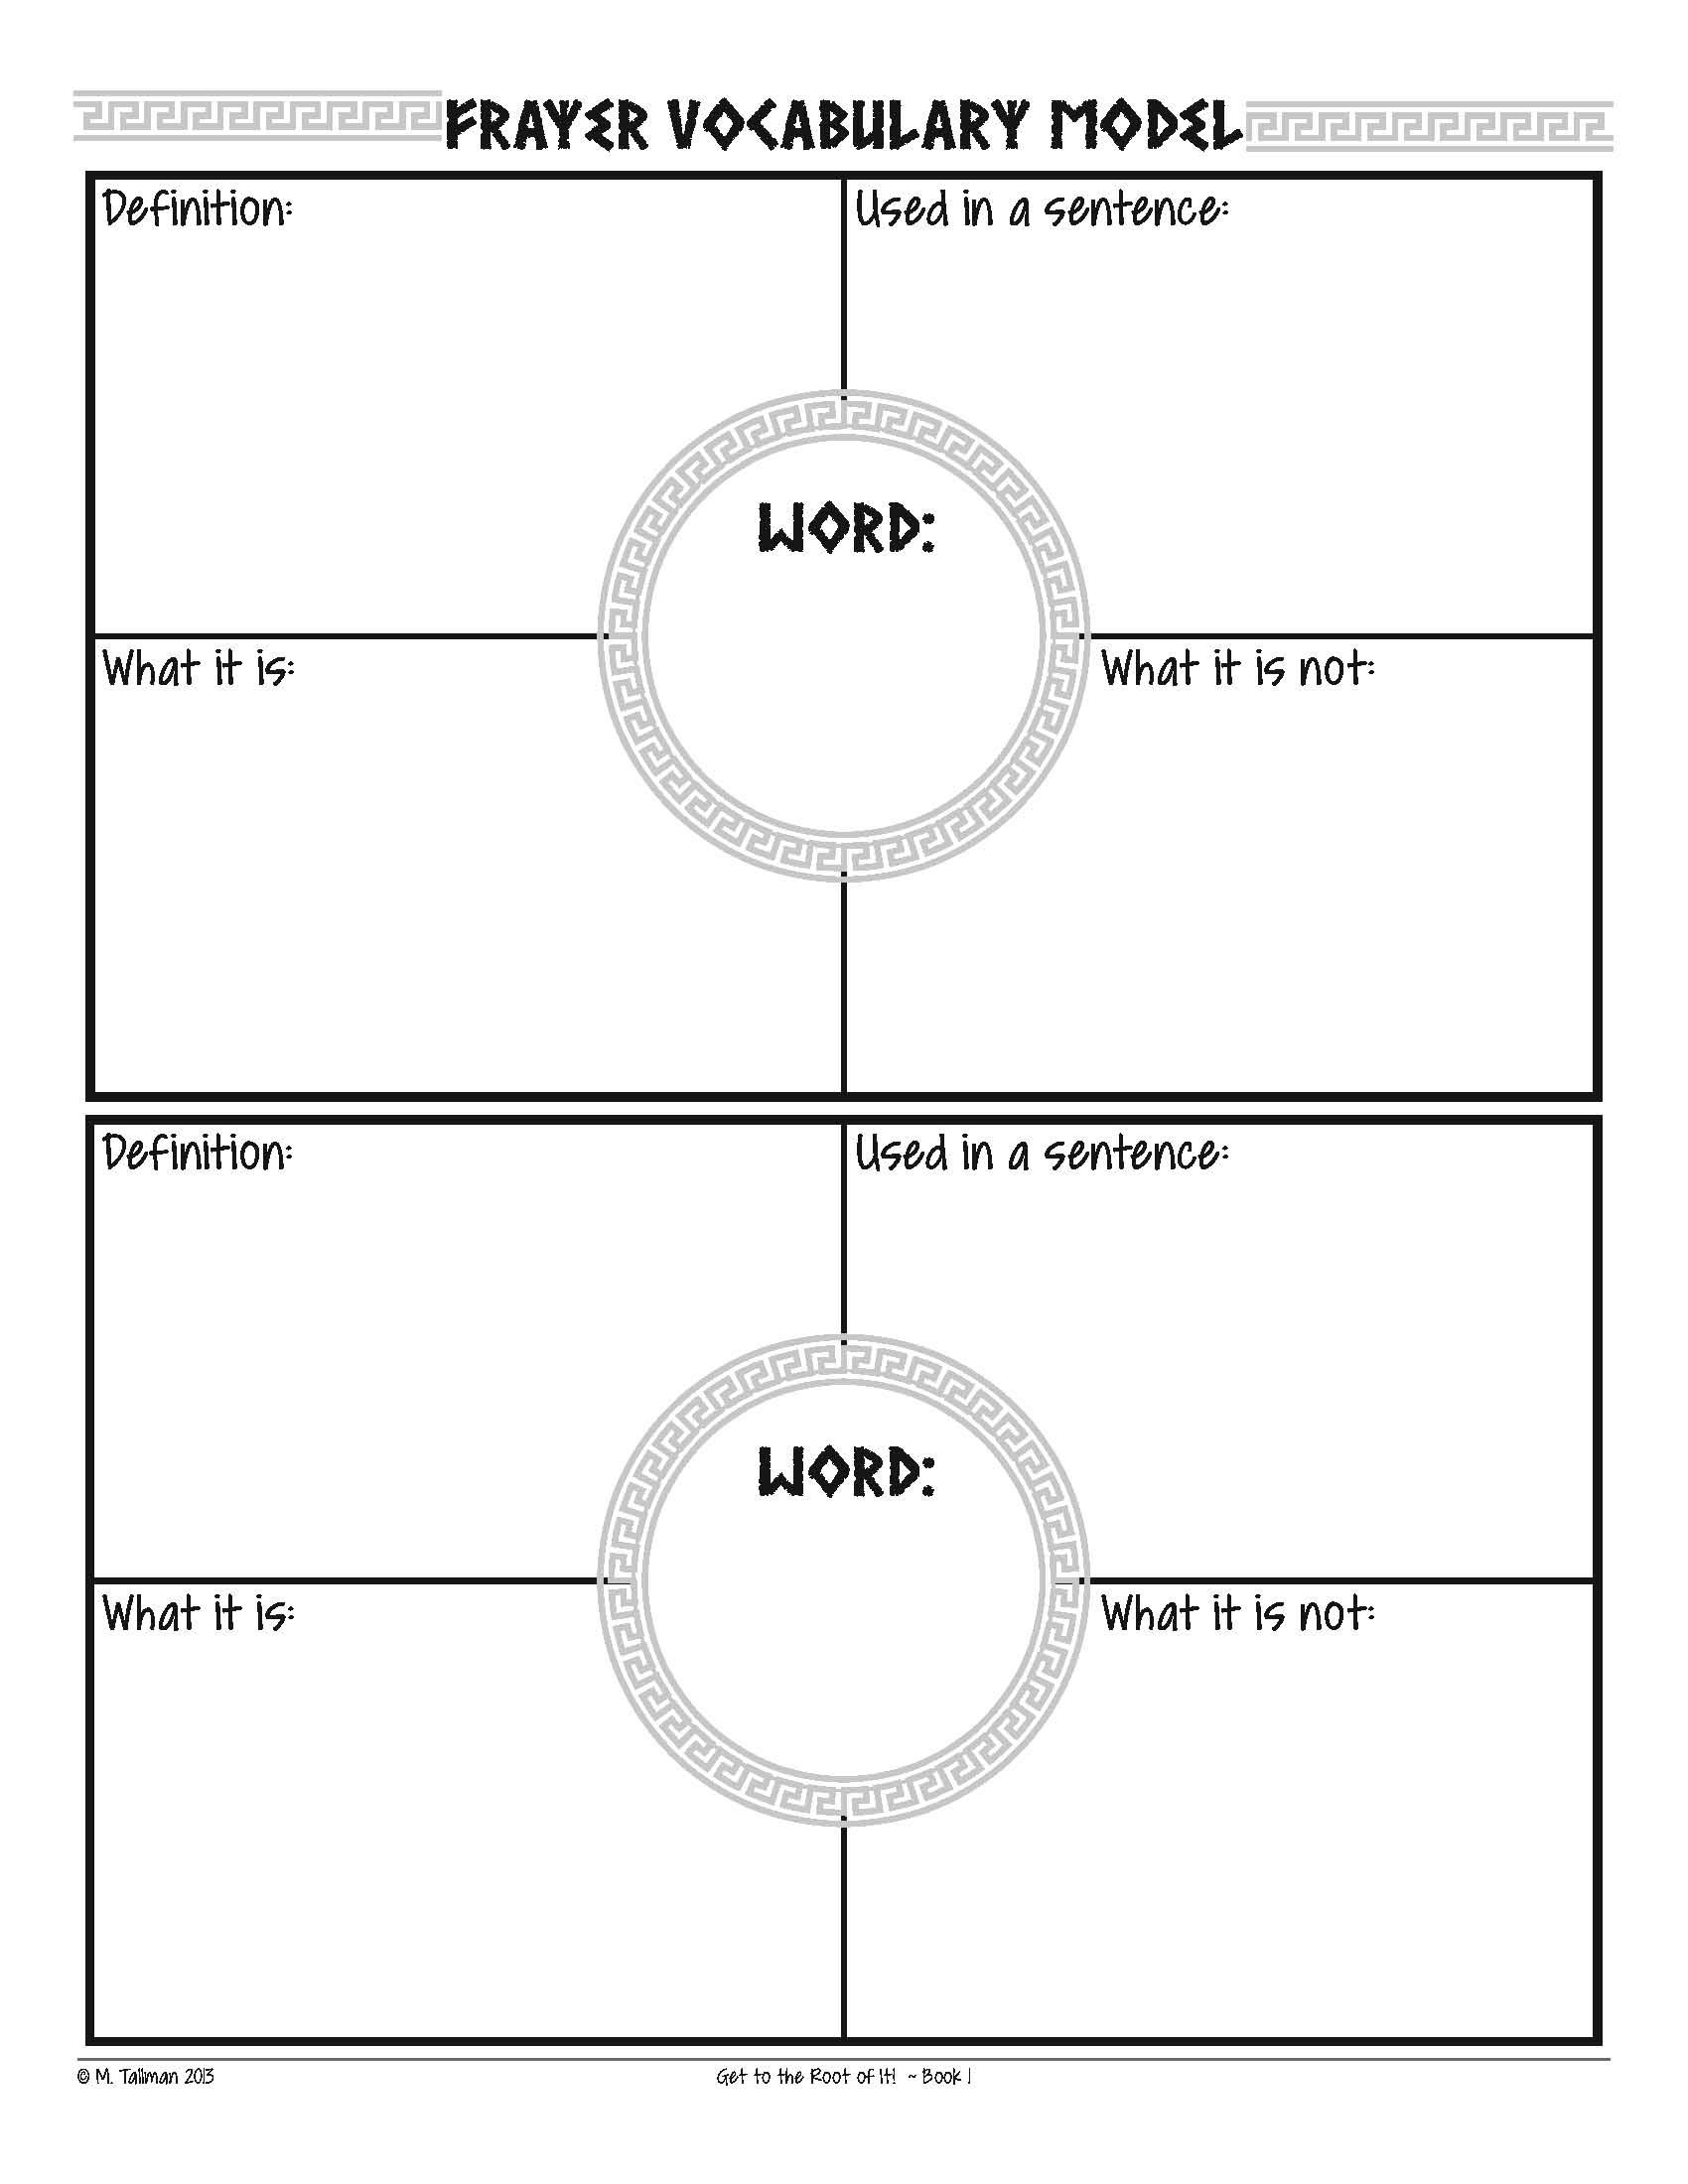 web diagram graphic organizer 5 7 vortec valve job free greek and latin root word activities grades 3 6